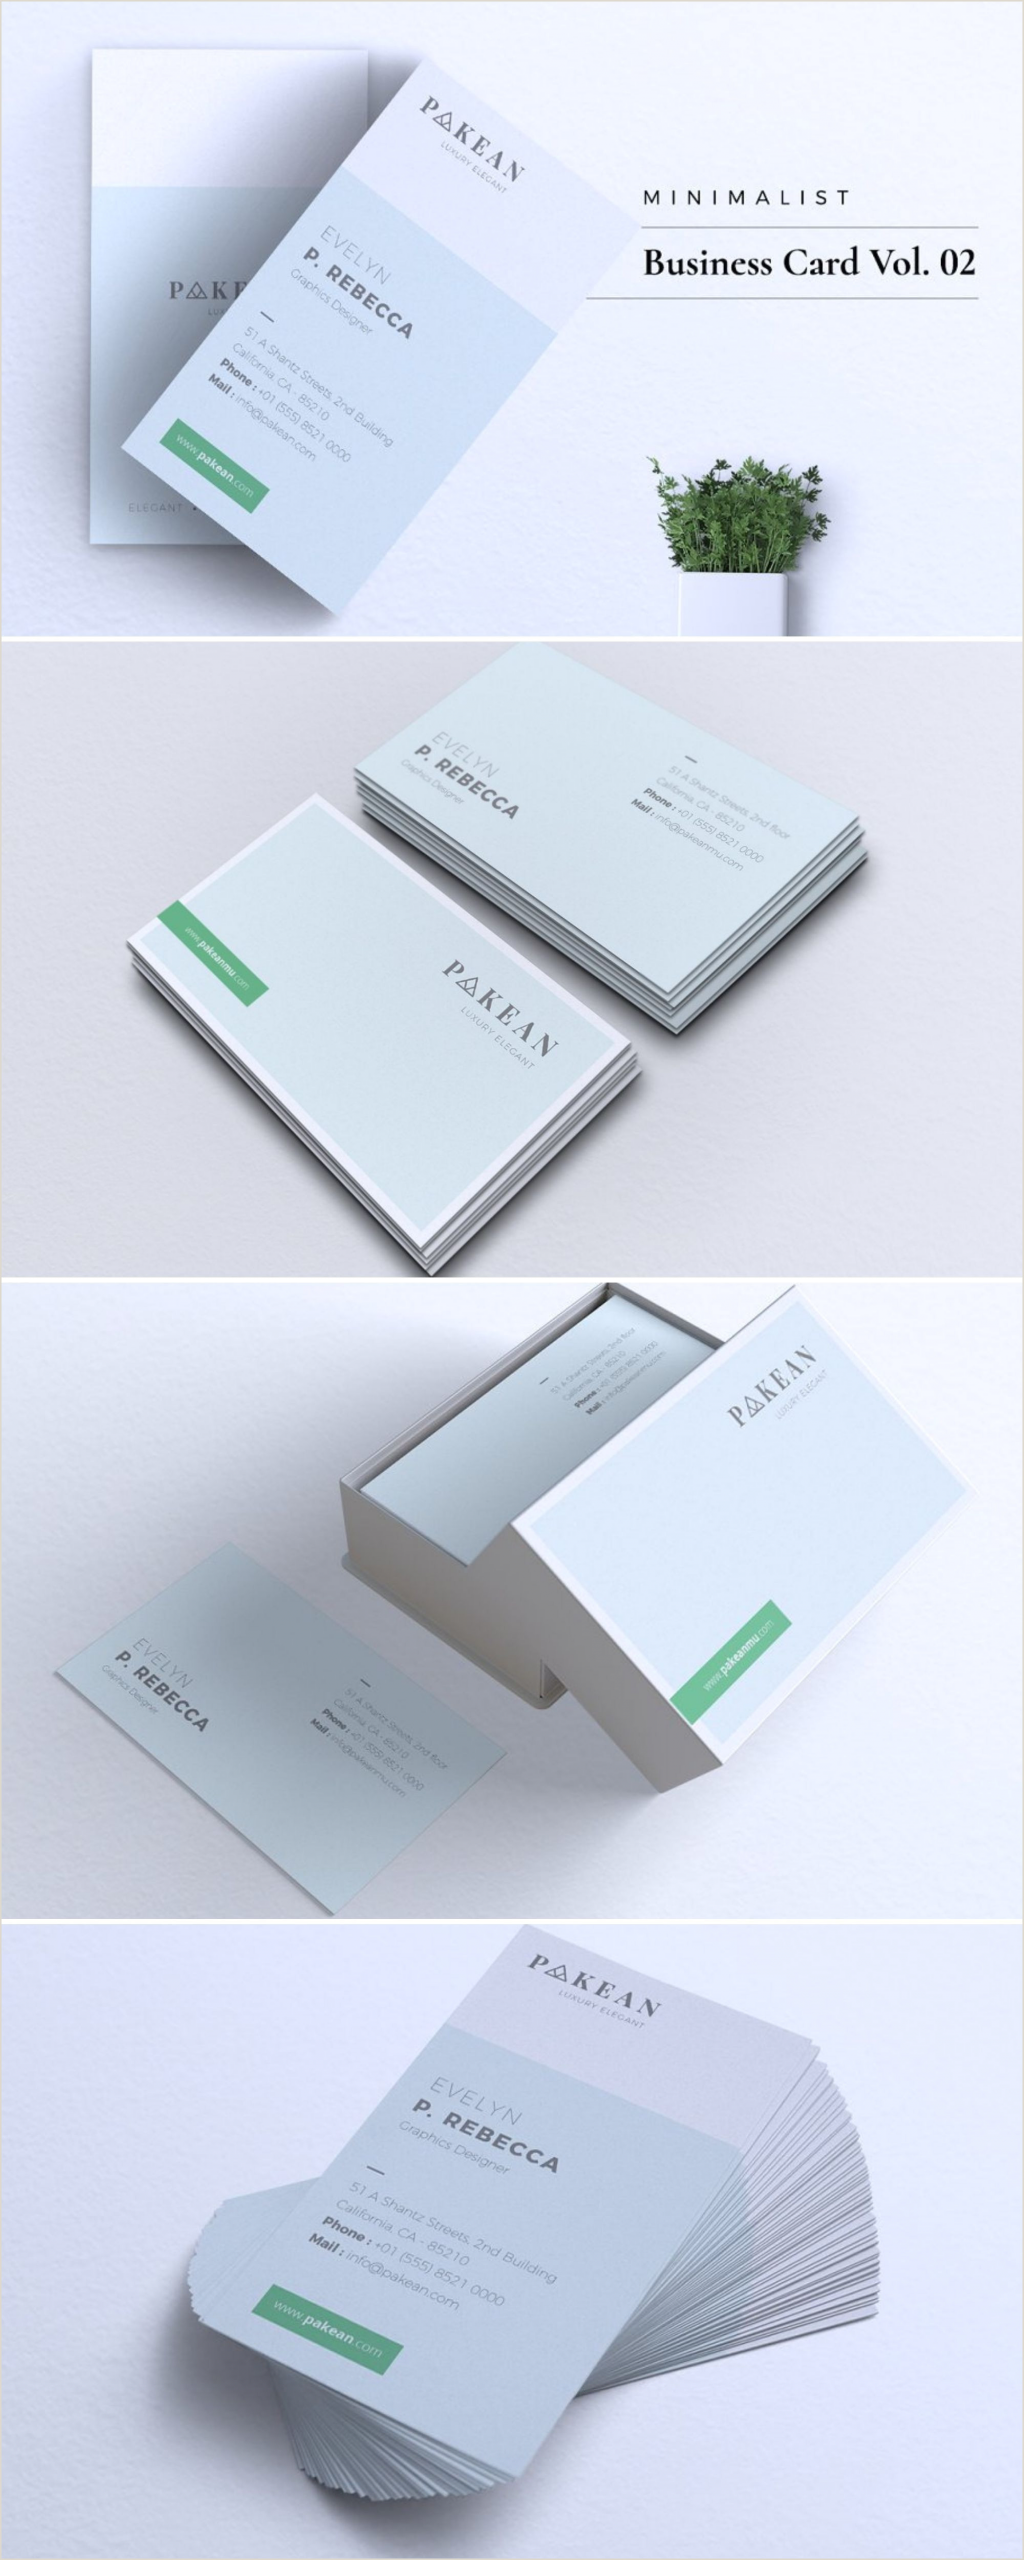 Simple Business Card Minimalist Business Card Vol 02